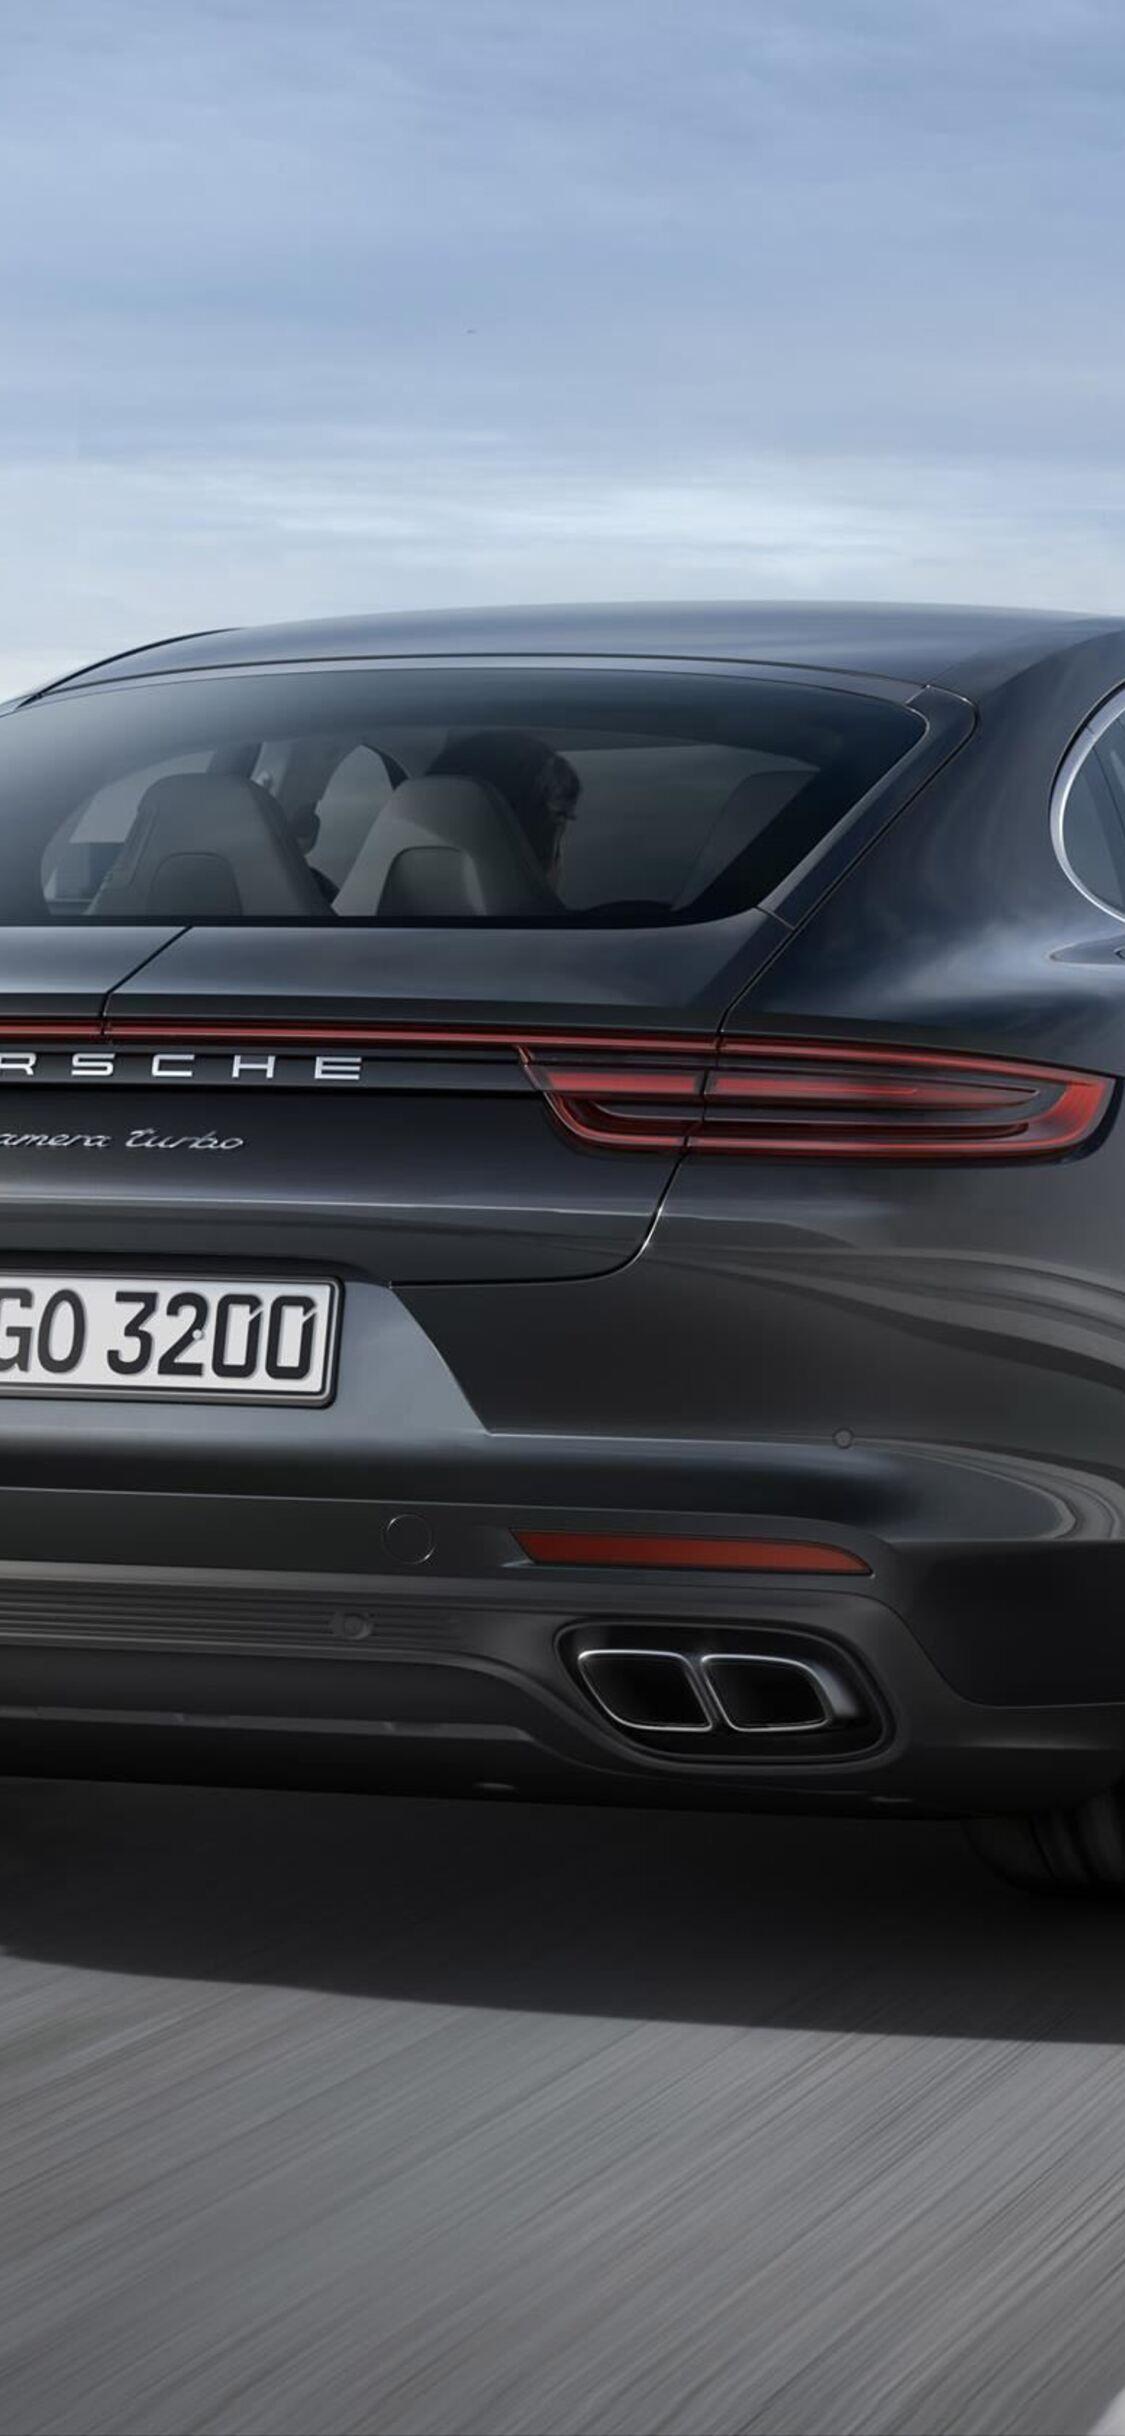 1125x2436 2017 Porsche Panamera Iphone Xs Iphone 10 Iphone X Hd 4k